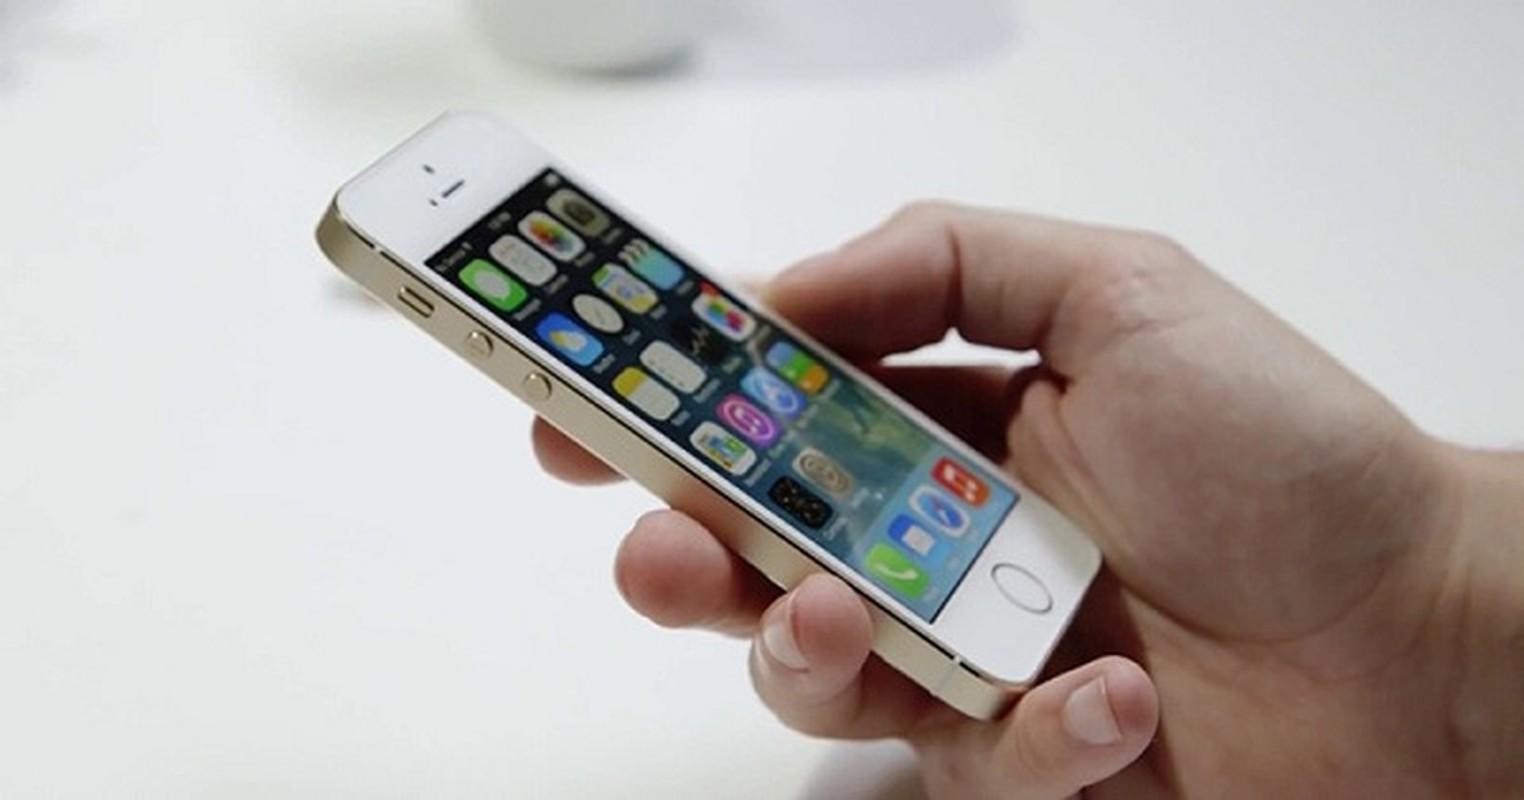 Tai sao iPhone 5S mat van tay xuong gia tham chi 500.000 dong?-Hinh-10